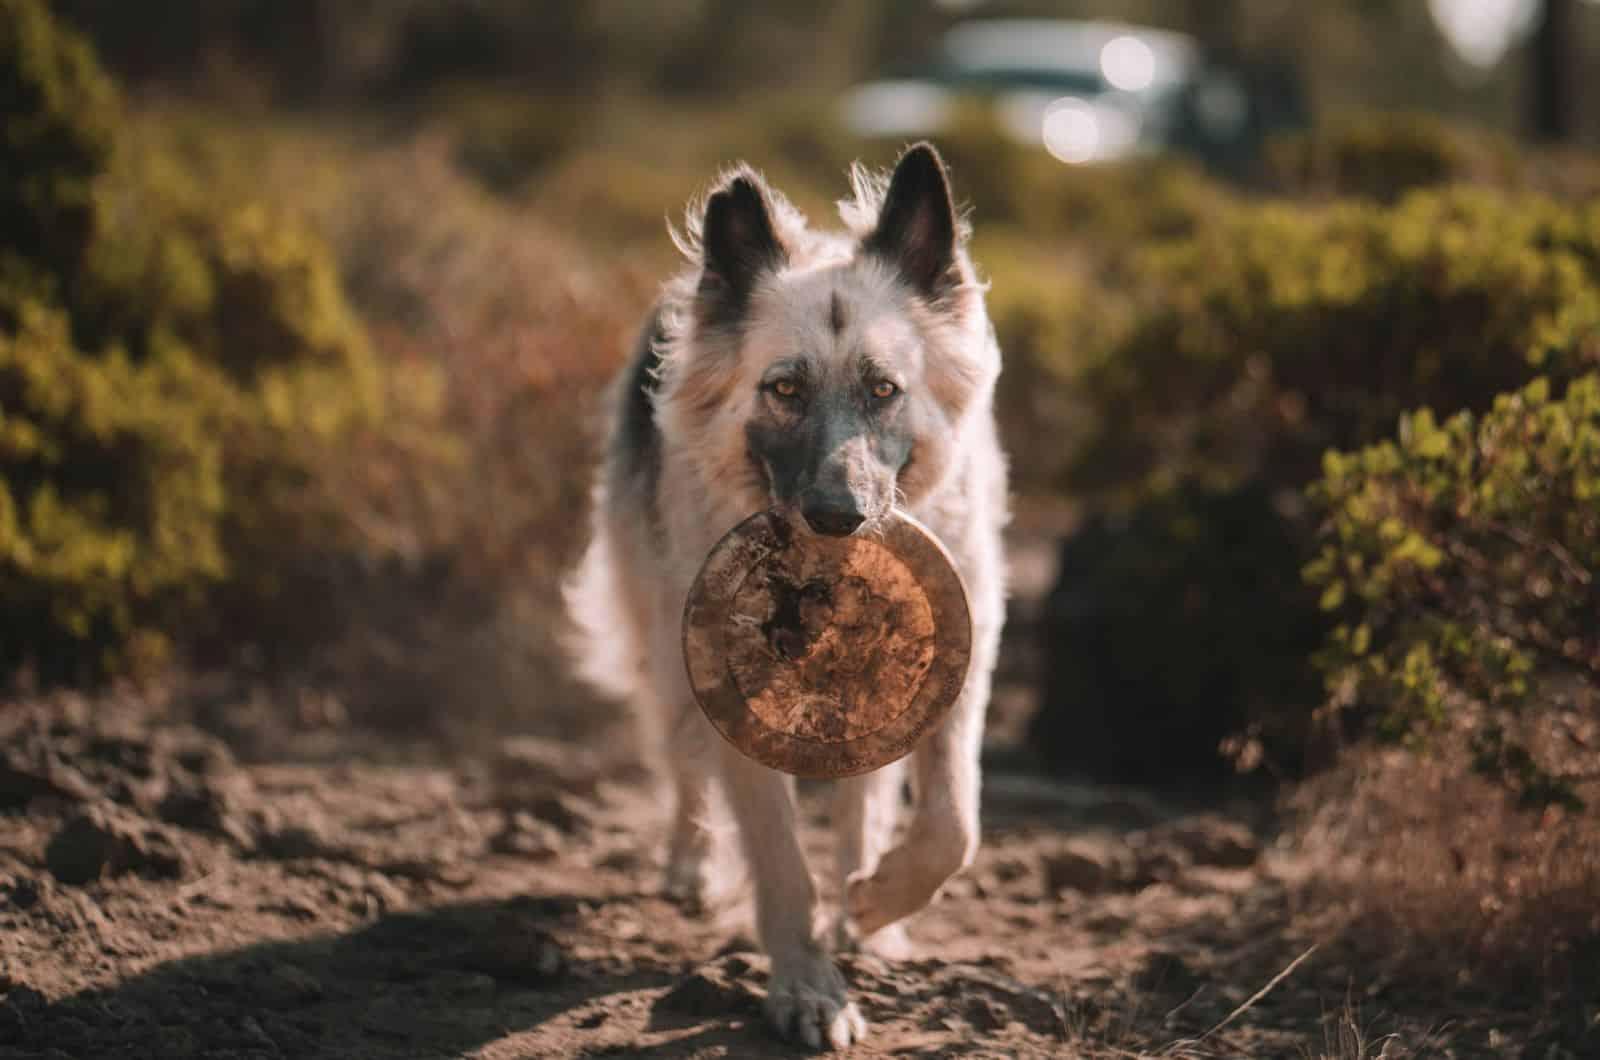 silver german shepherd with a frisbee